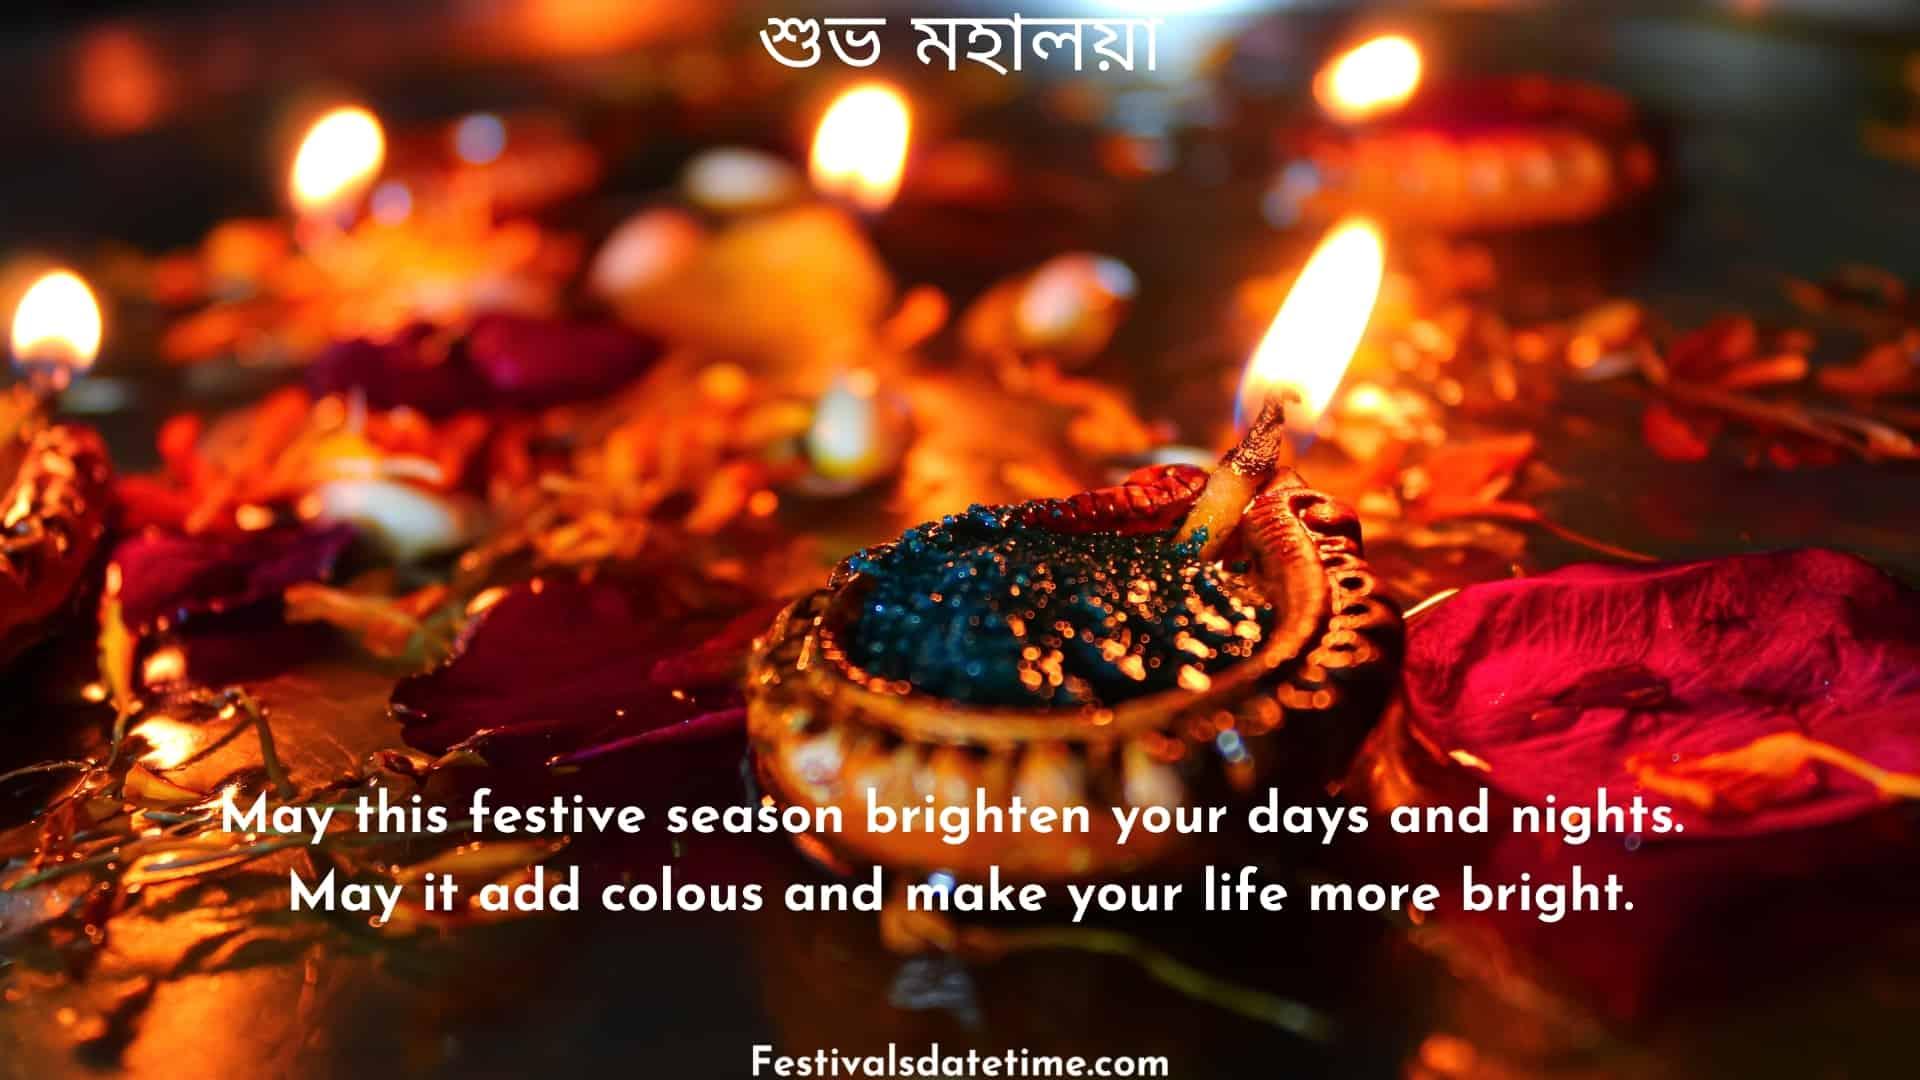 happy_mahalaya_amavasya_images